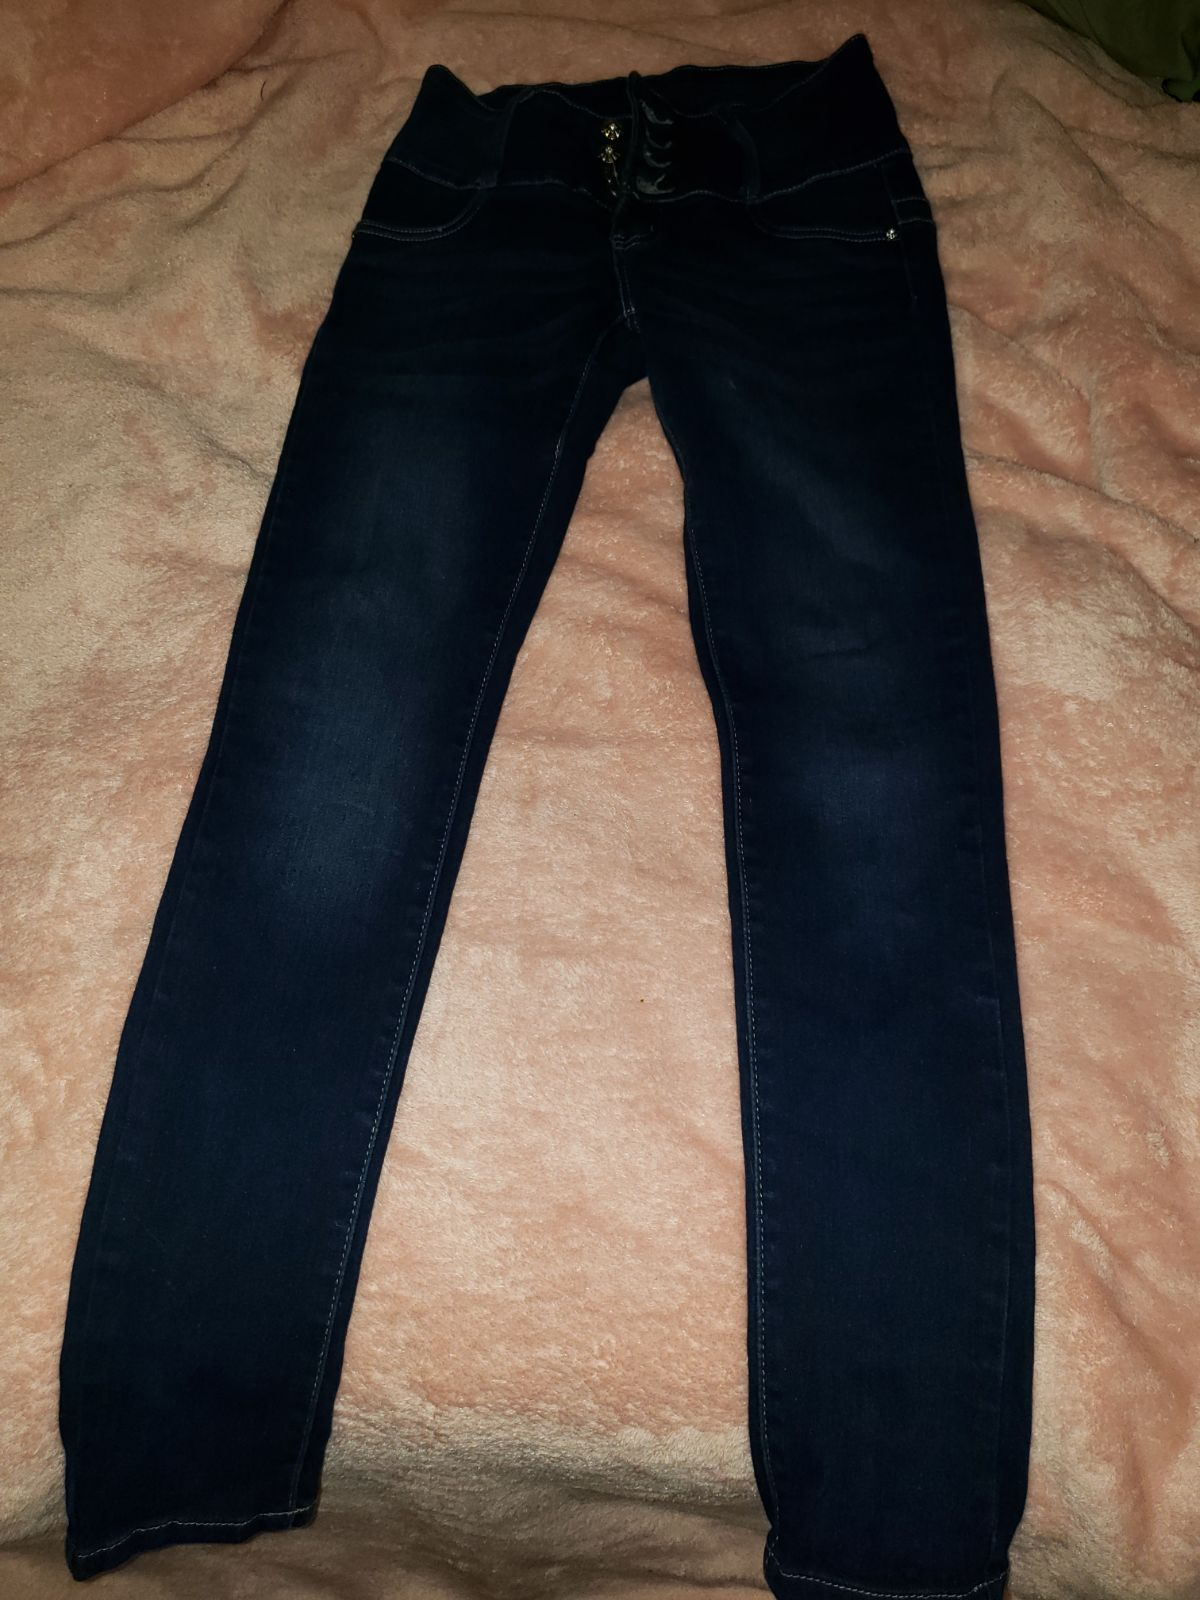 Size 1 Bella skinny jeans